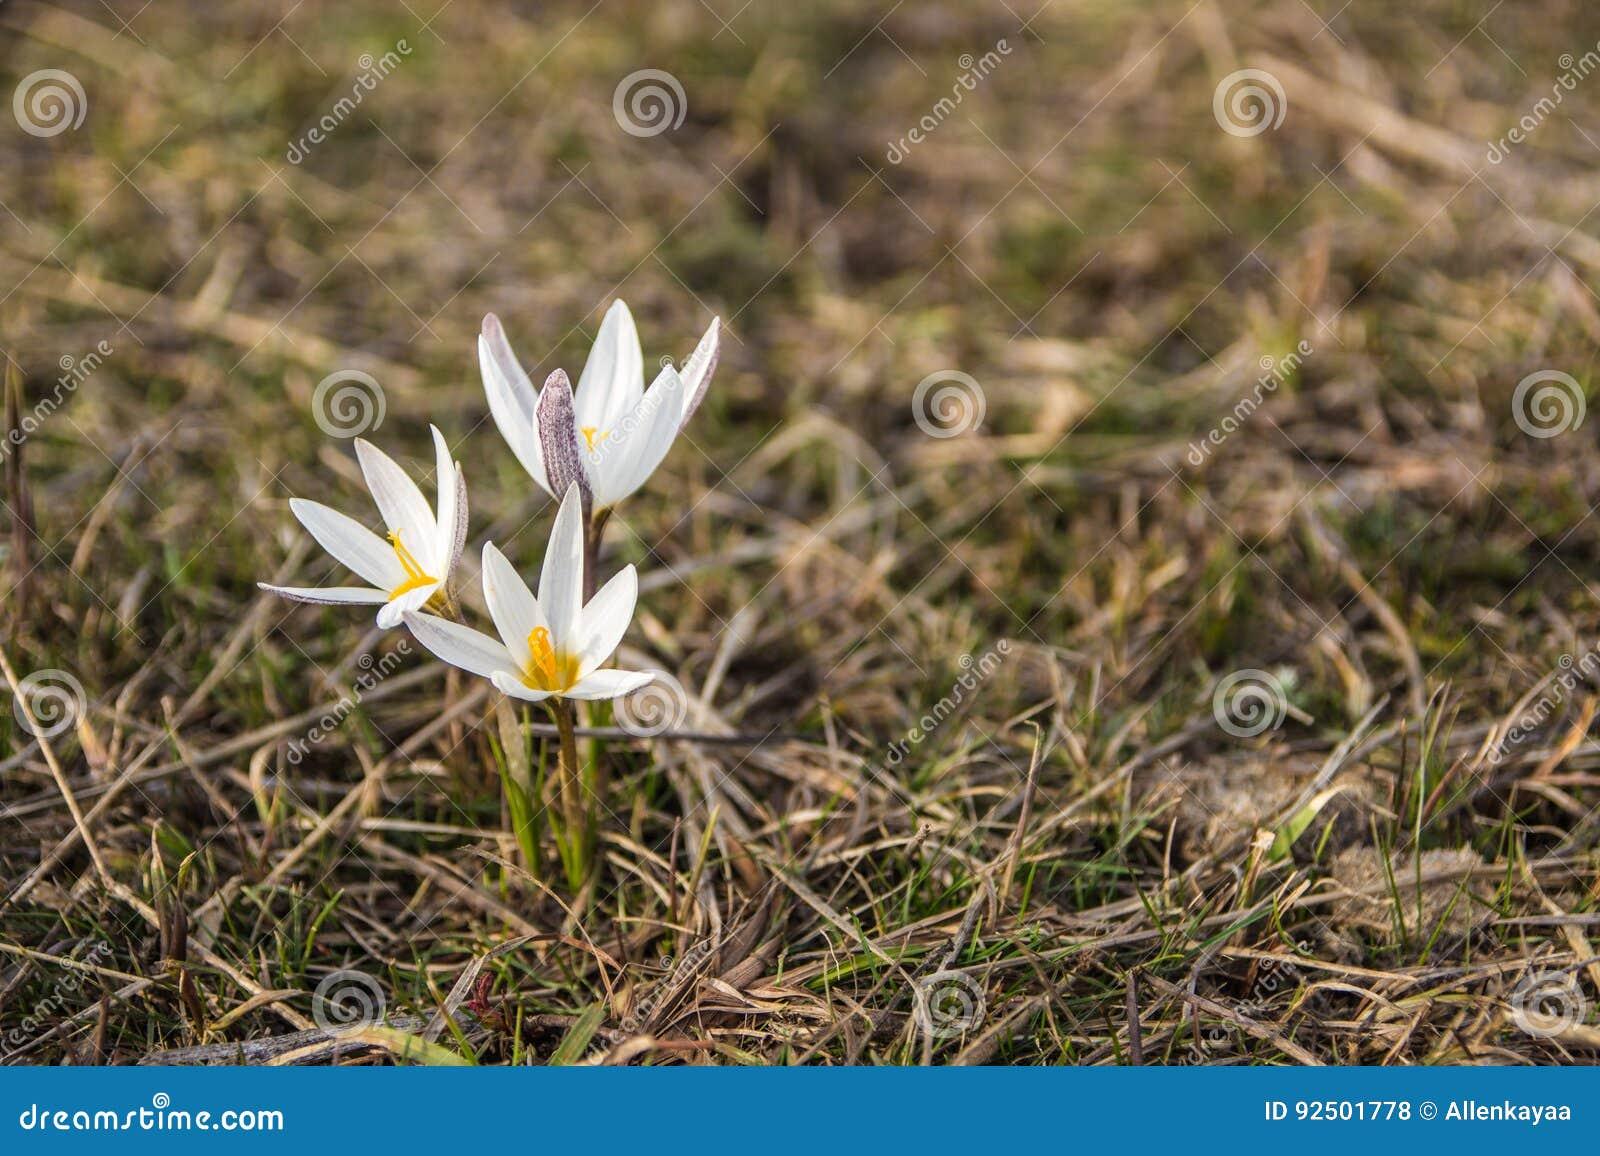 Crocus Primrose First Spring Flowers Almaty Kazakhstan Stock